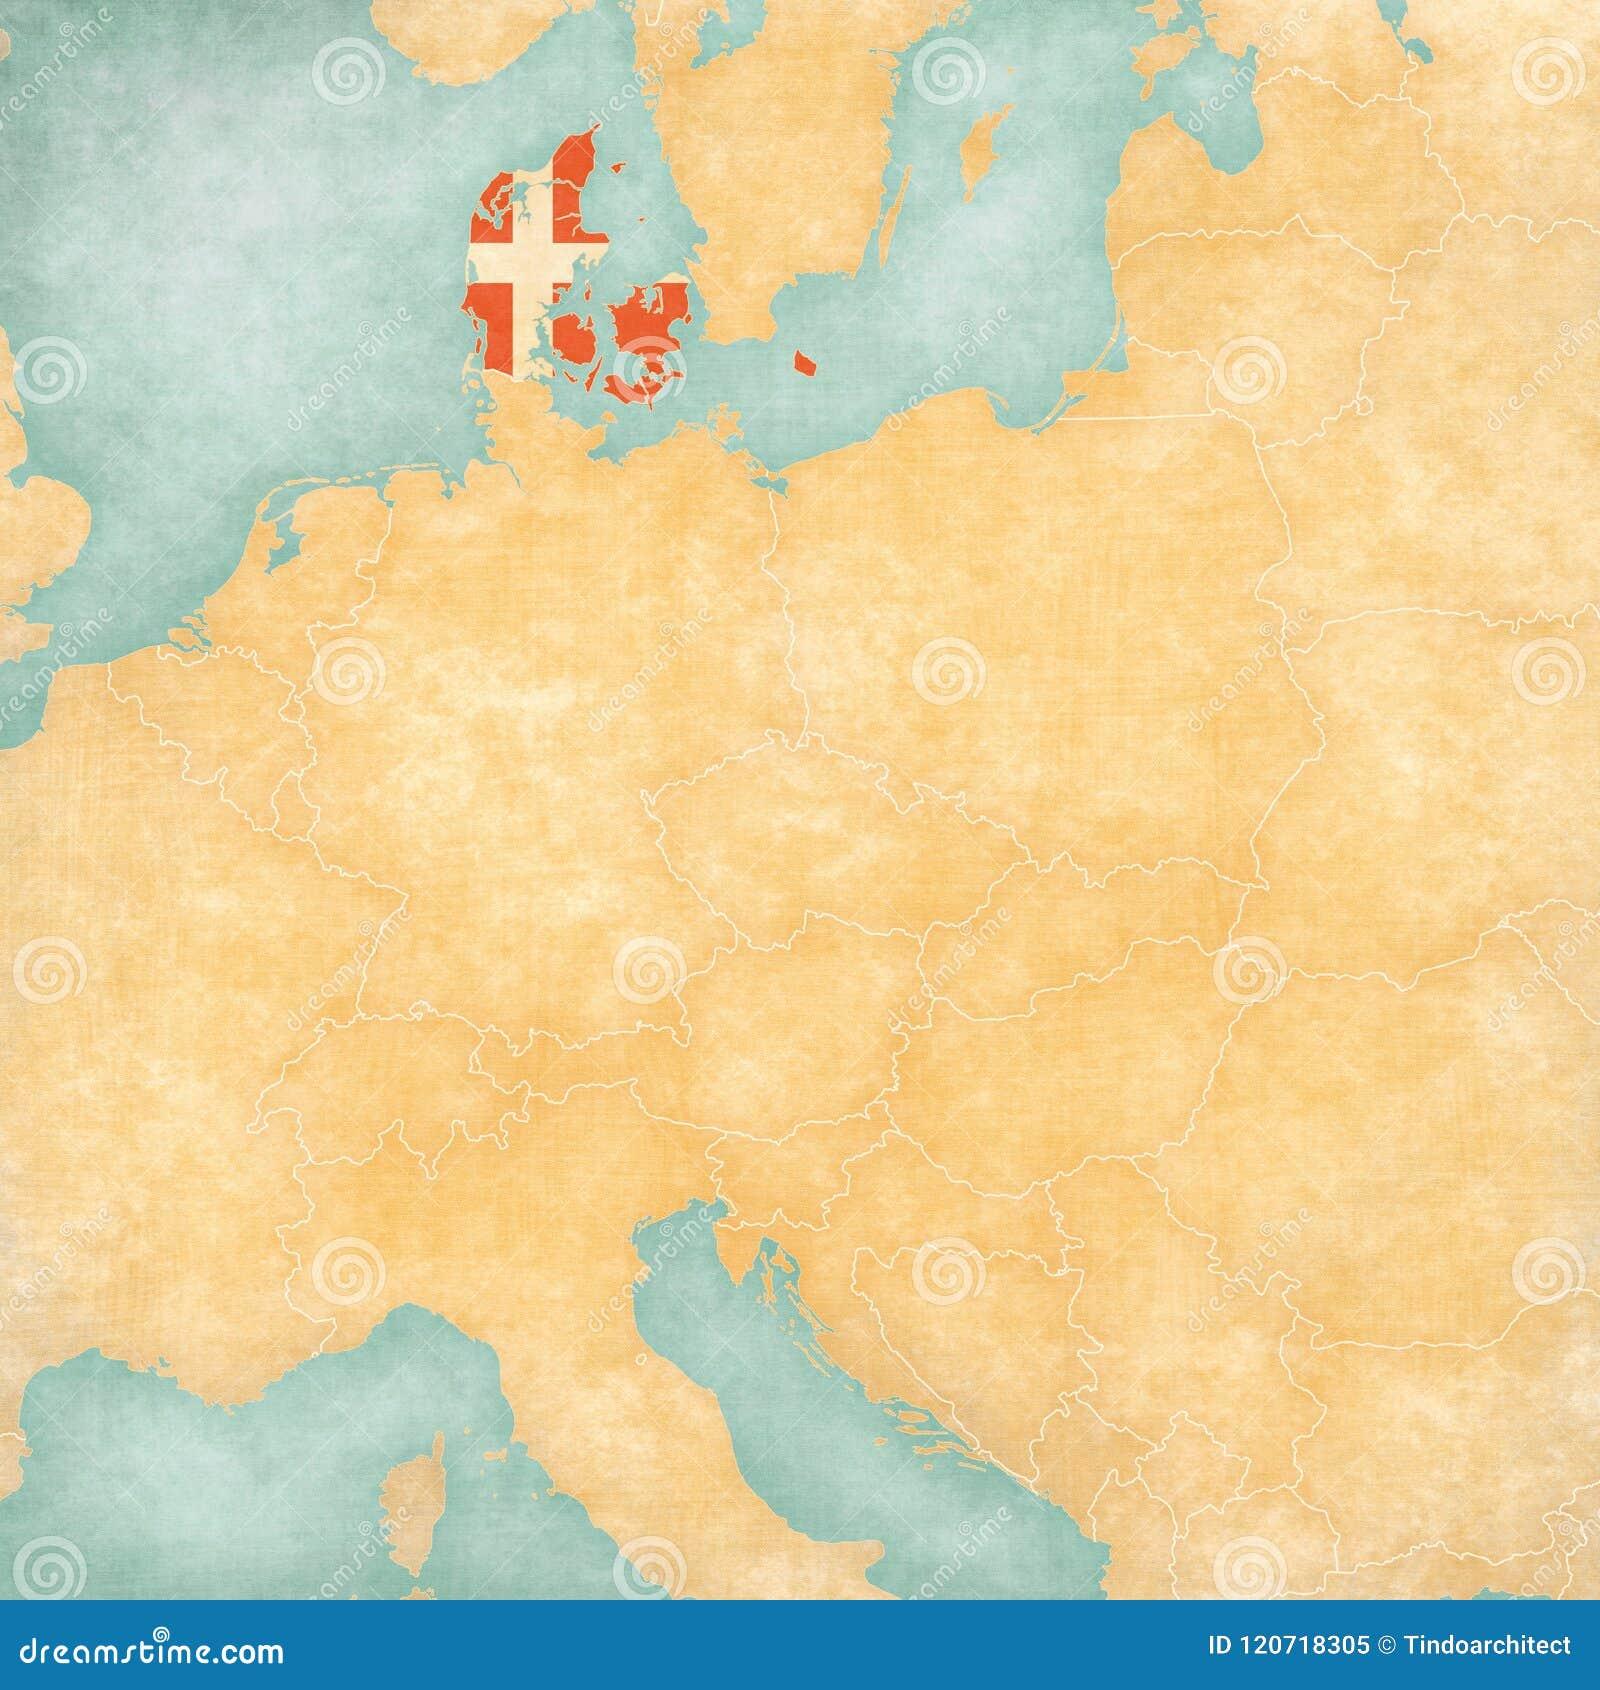 Map Of Central Europe - Denmark Stock Illustration - Illustration of ...